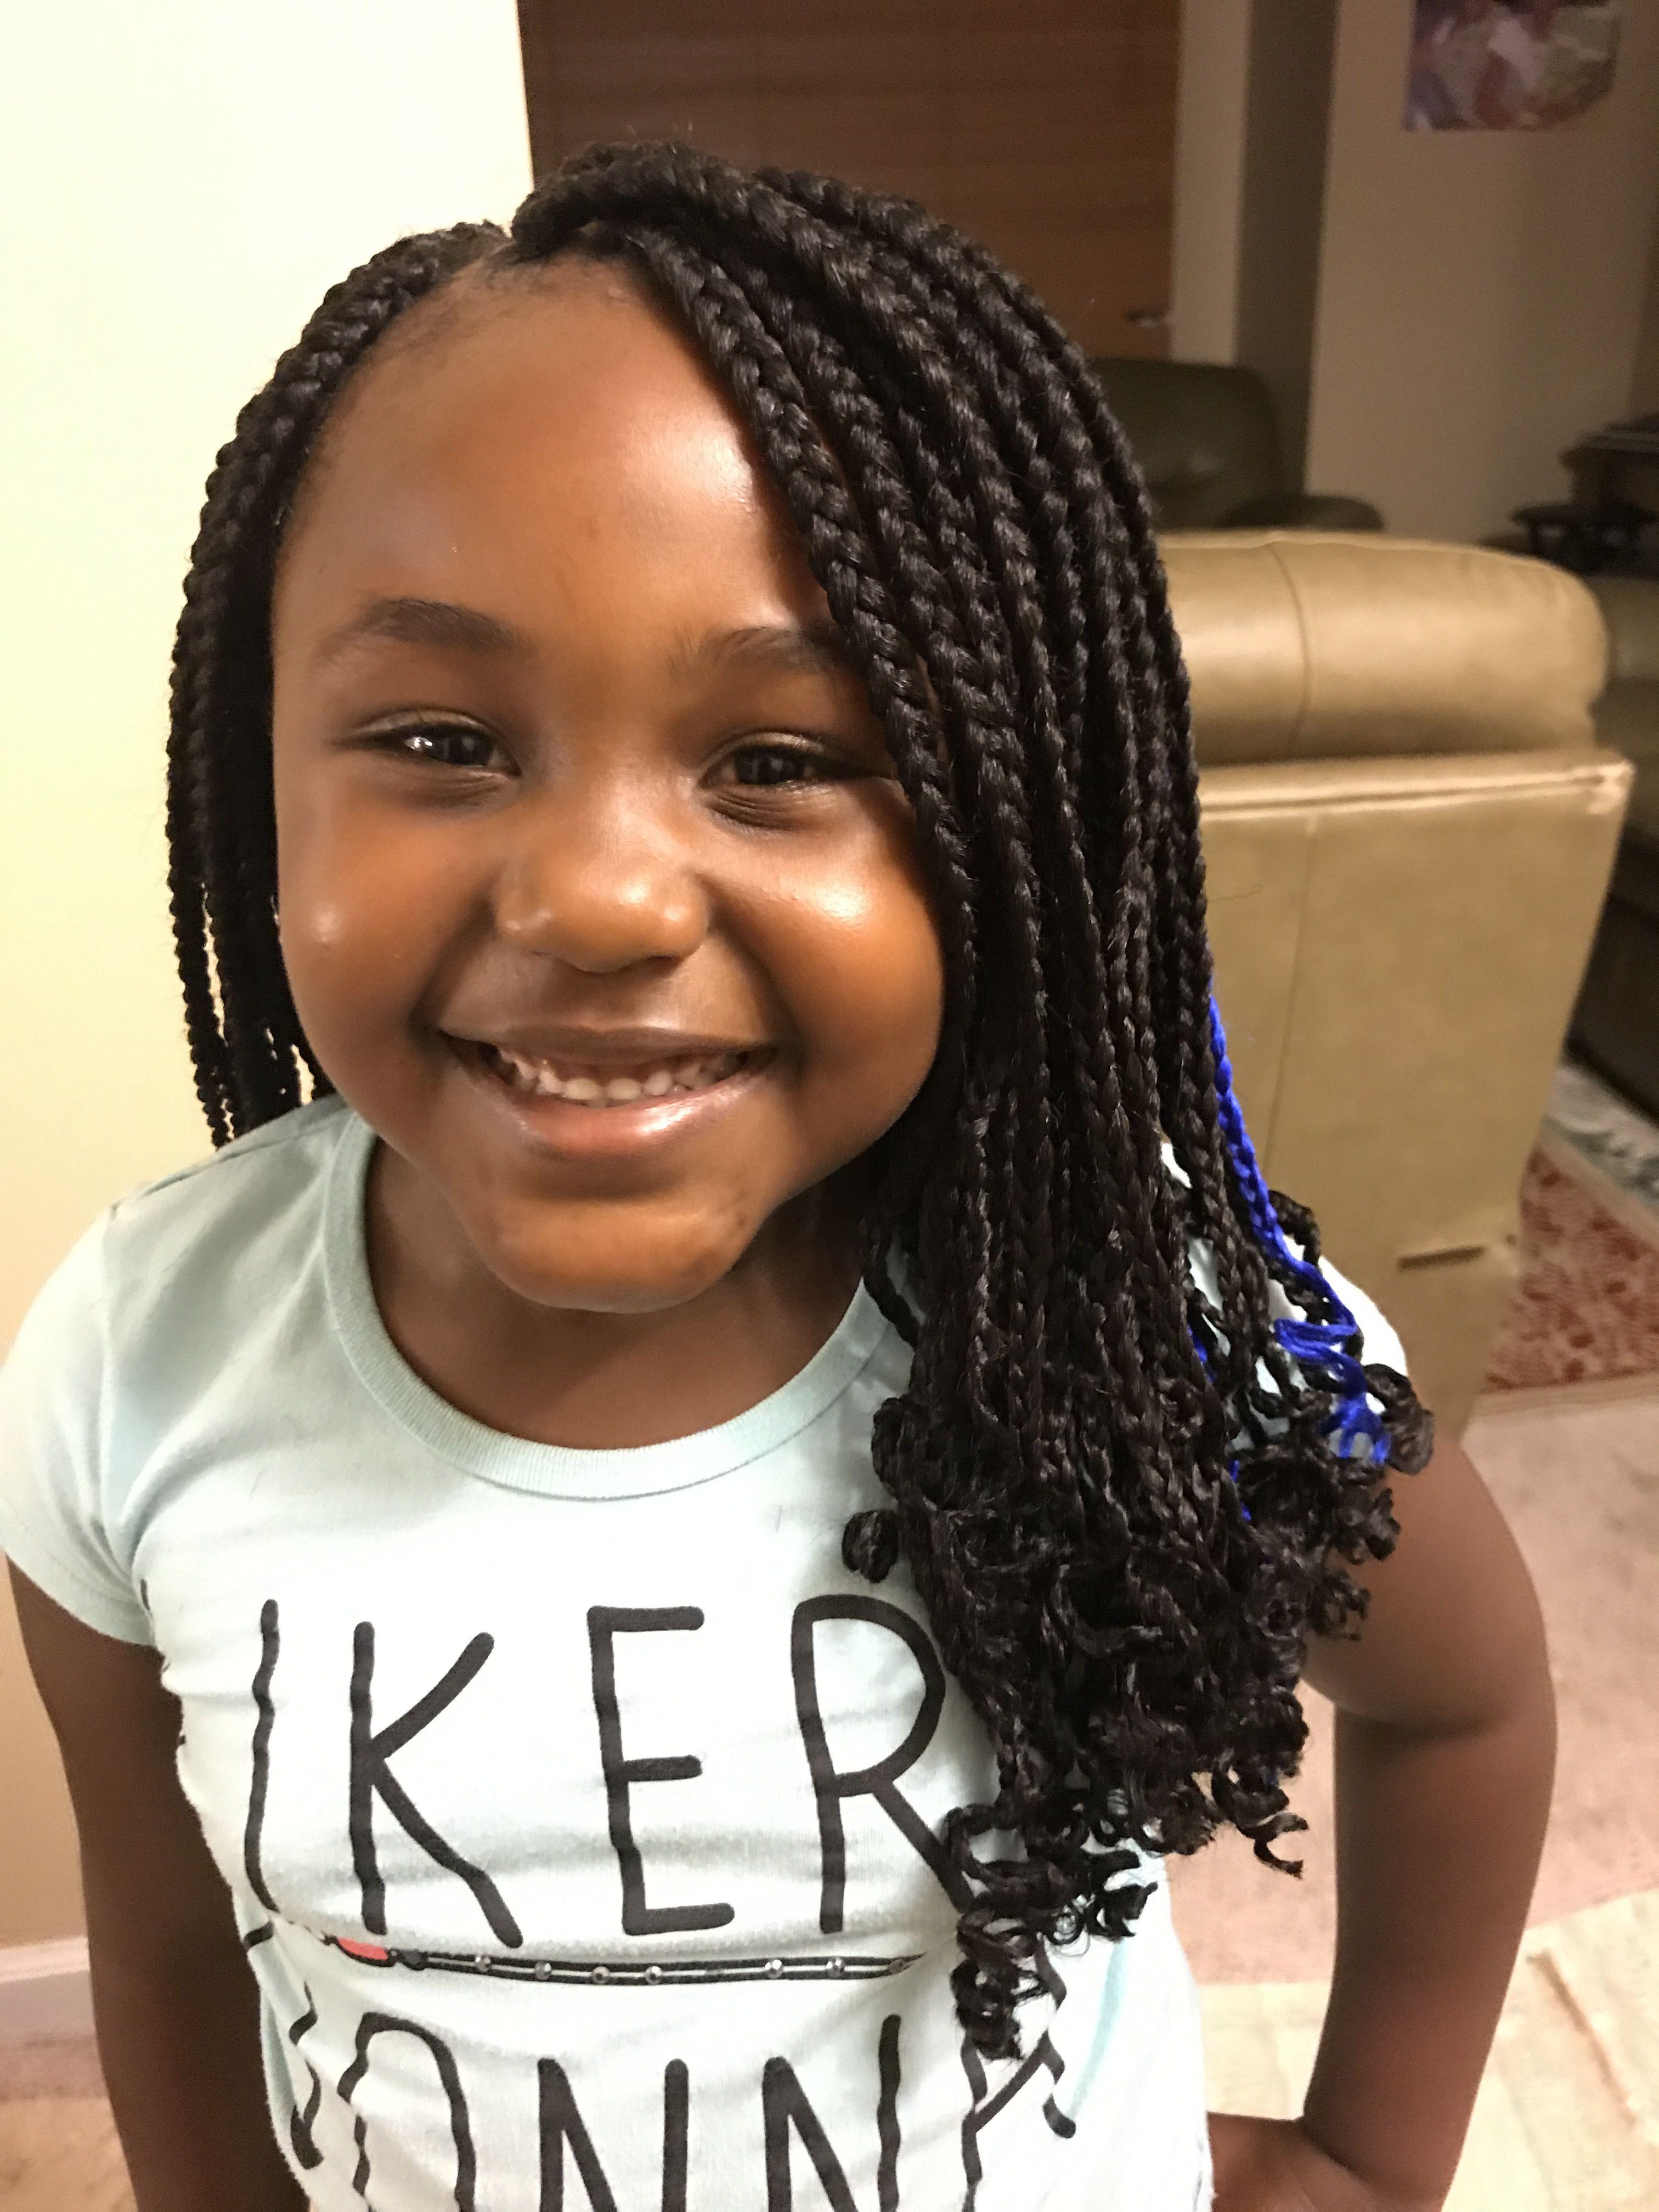 Pin by Sin on Kids braids in 2019